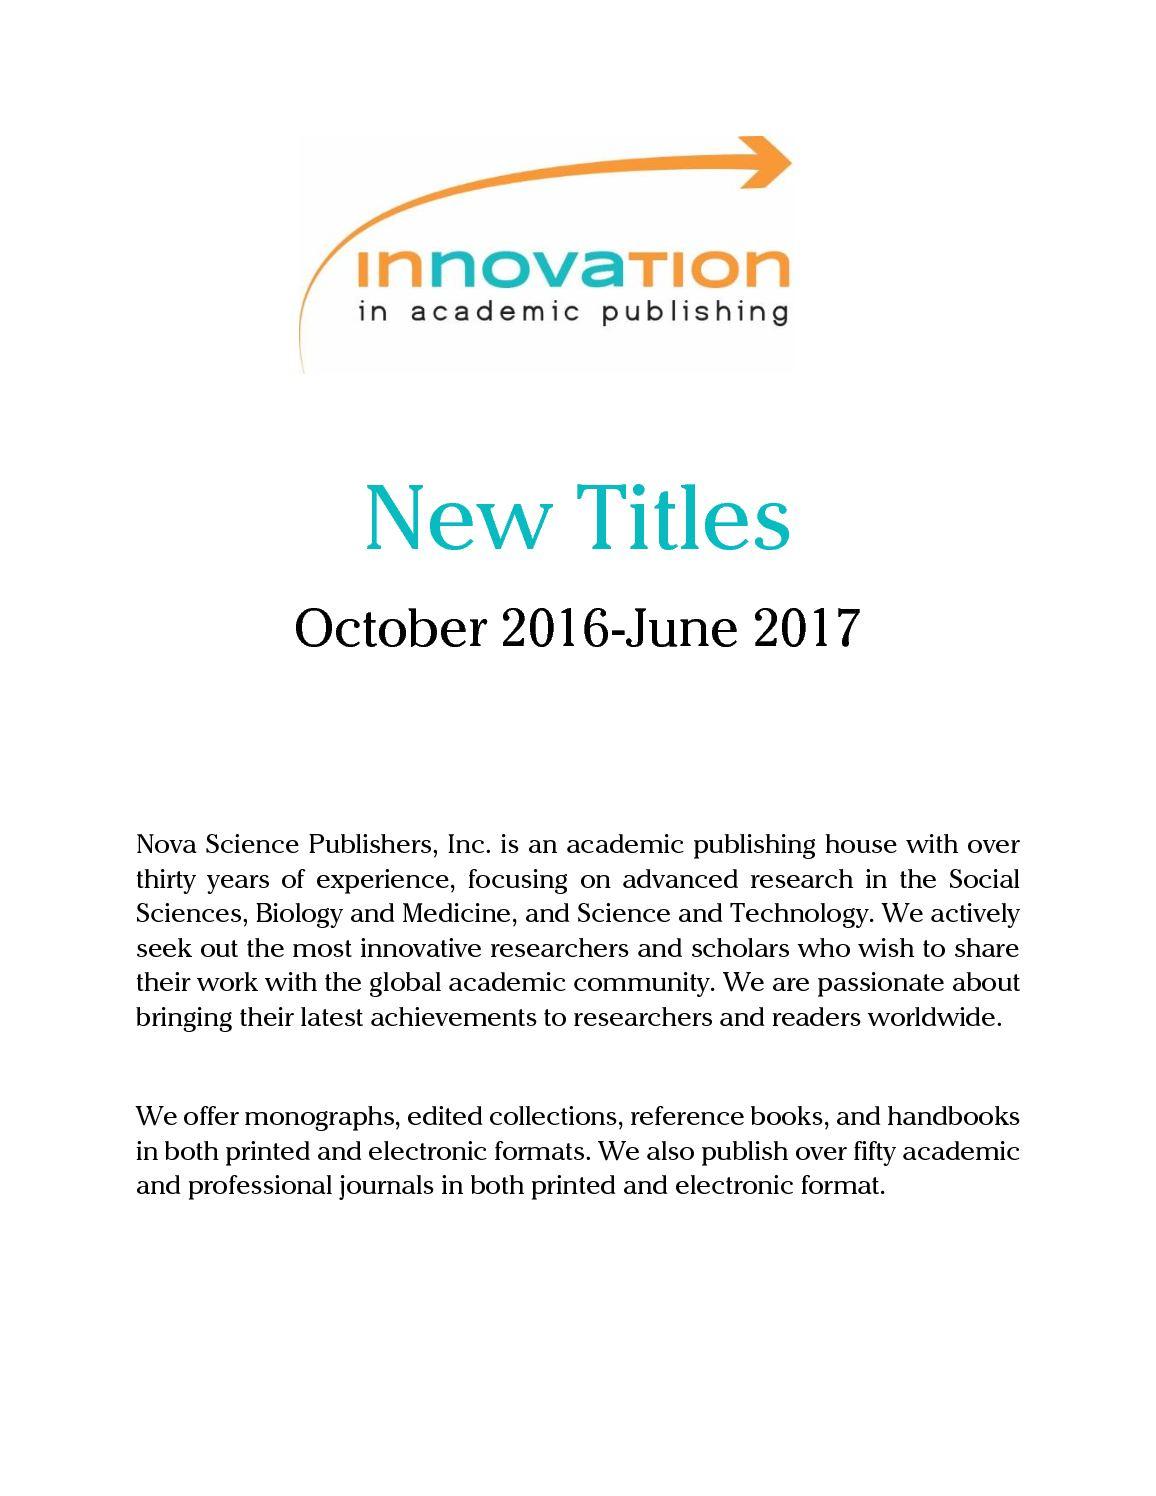 Calameo Catalog 2017 Nova Science Publishers